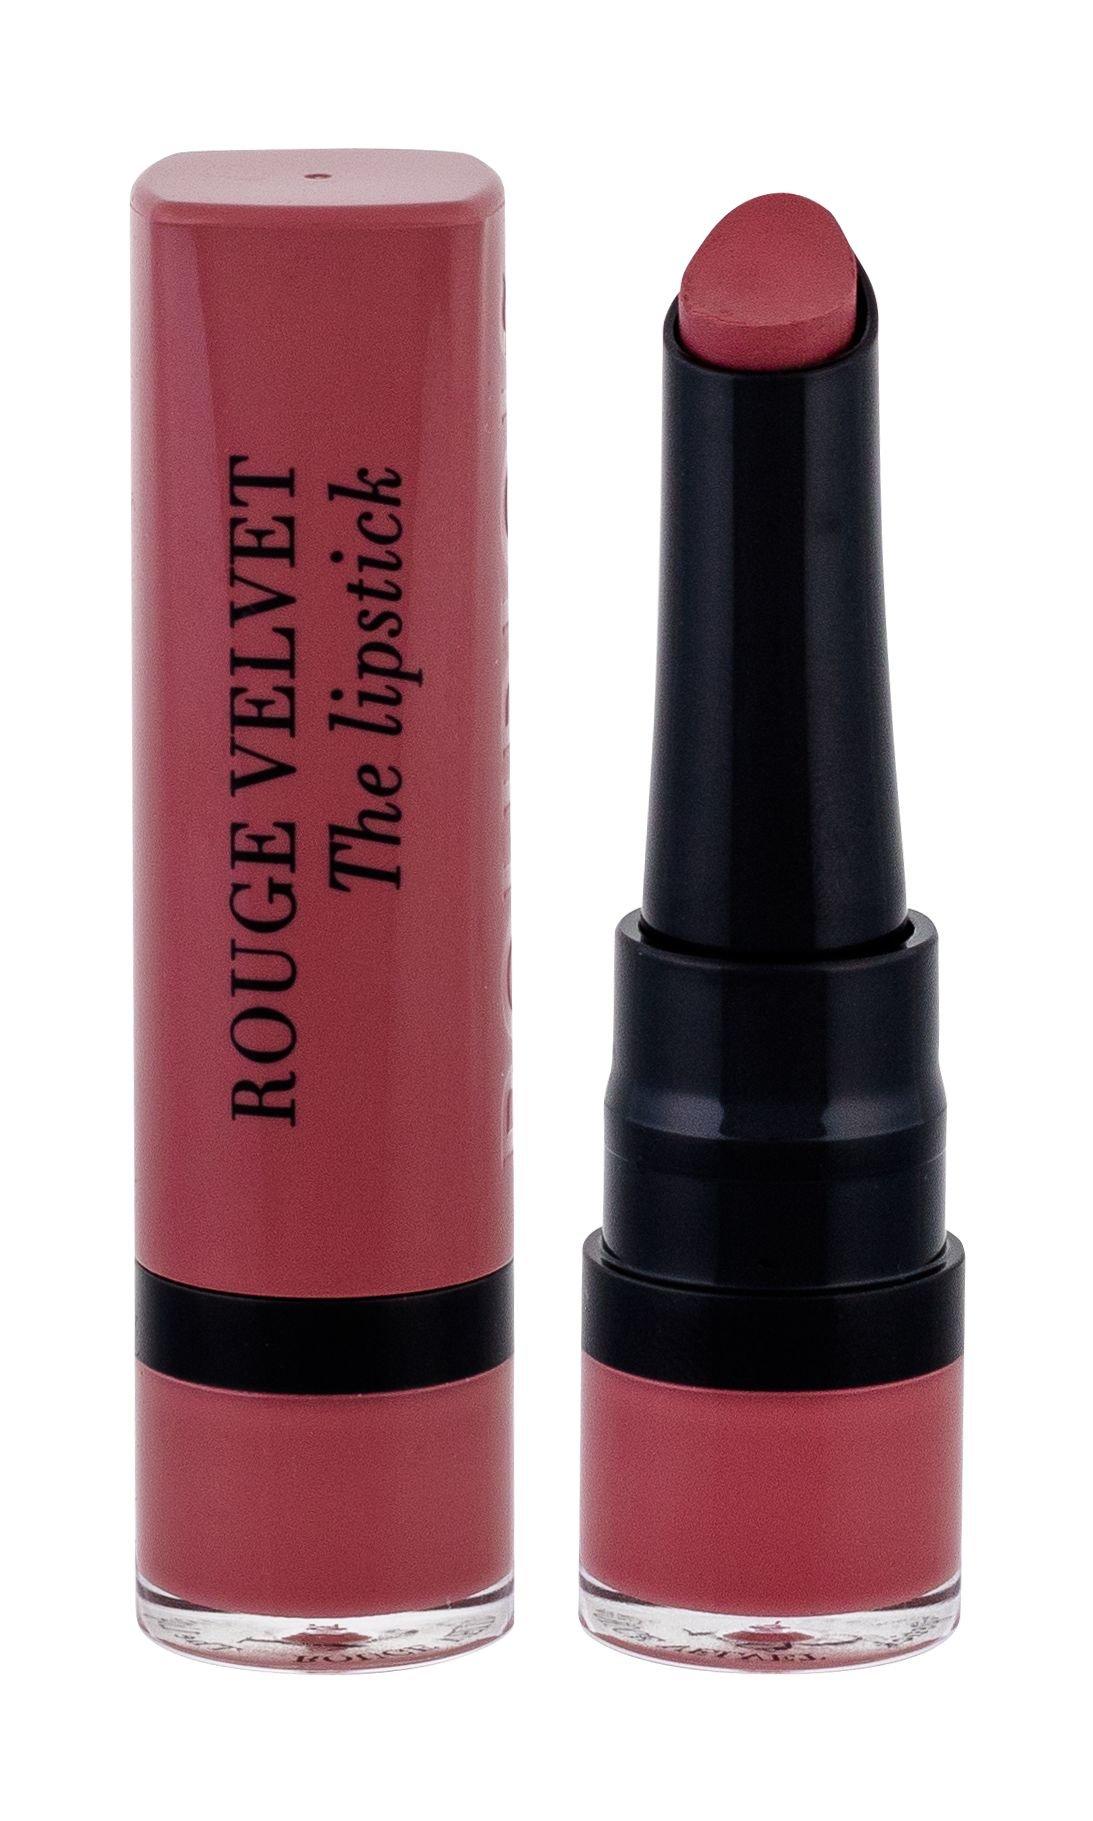 BOURJOIS Paris Rouge Velvet Lipstick 2,4ml 13 Nohalicious